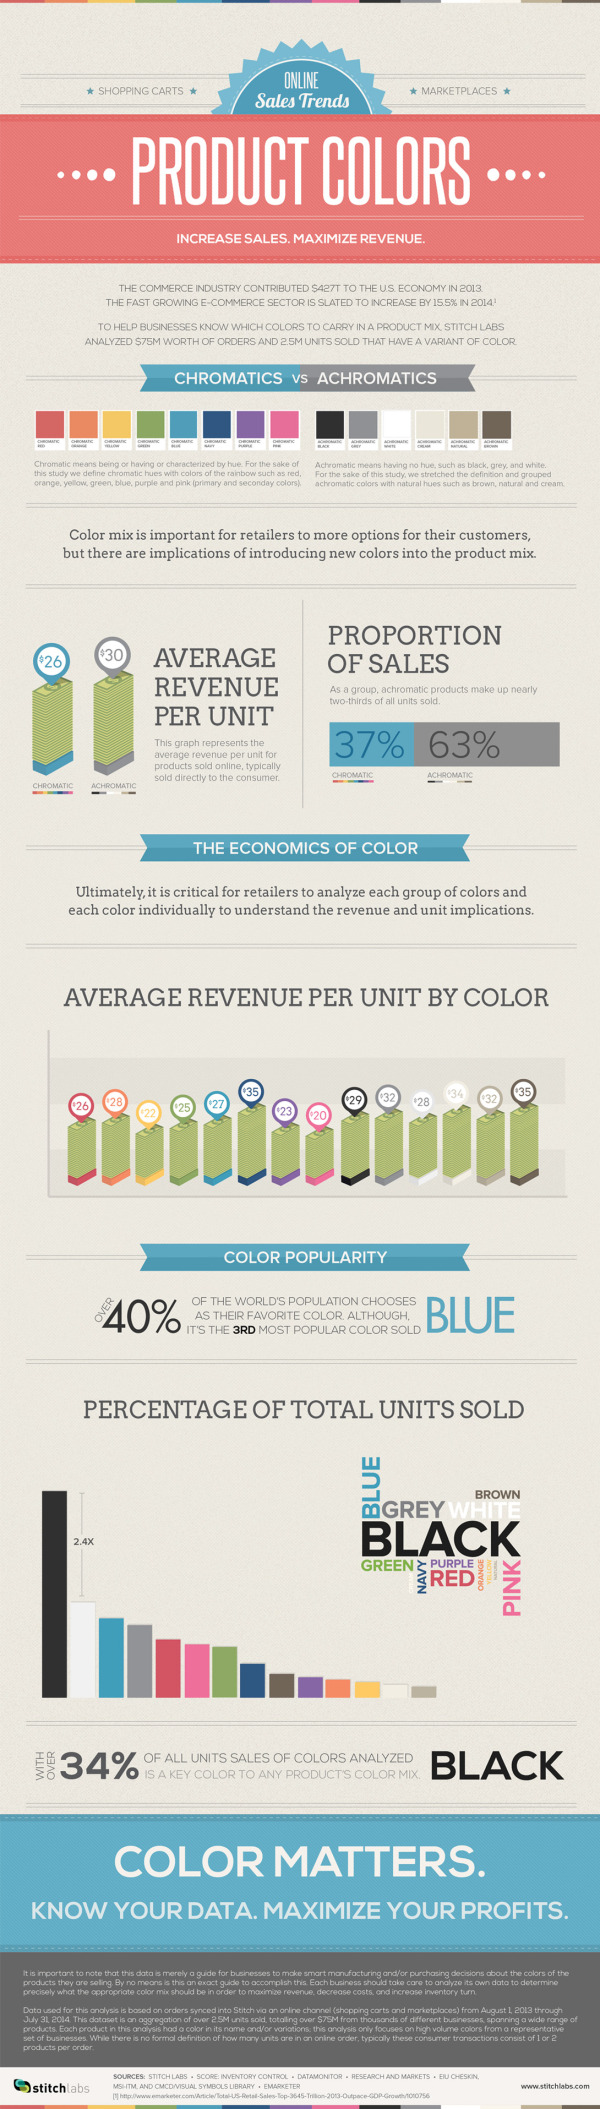 Online Sales Trends - Color Matters infographic